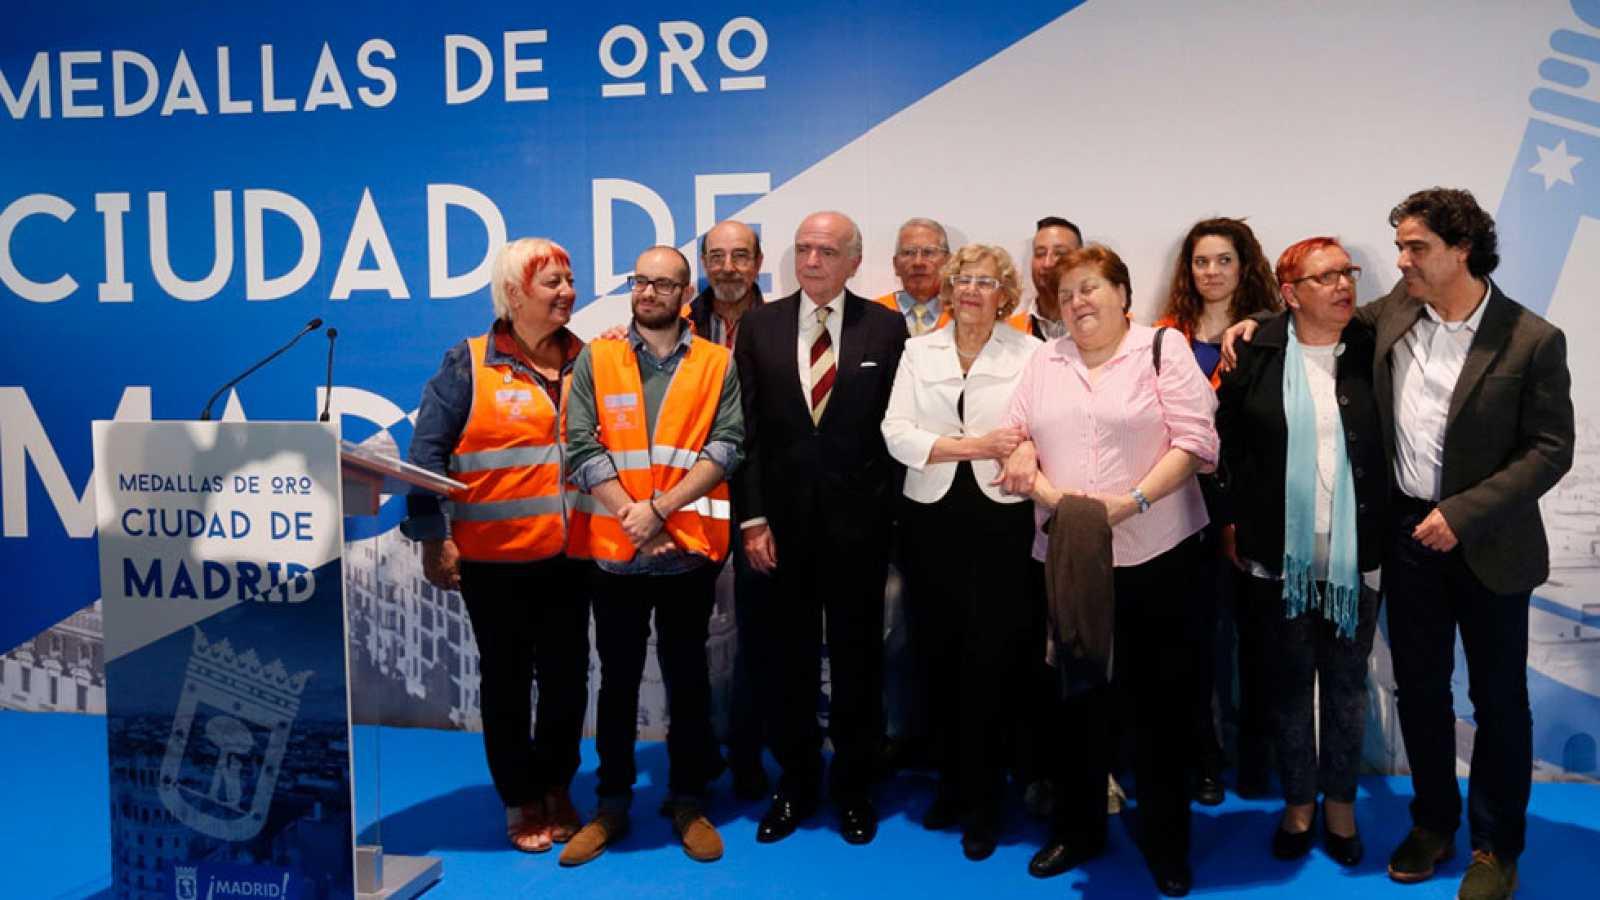 Madres contra la droga recibe la medalla de oro de Madrid